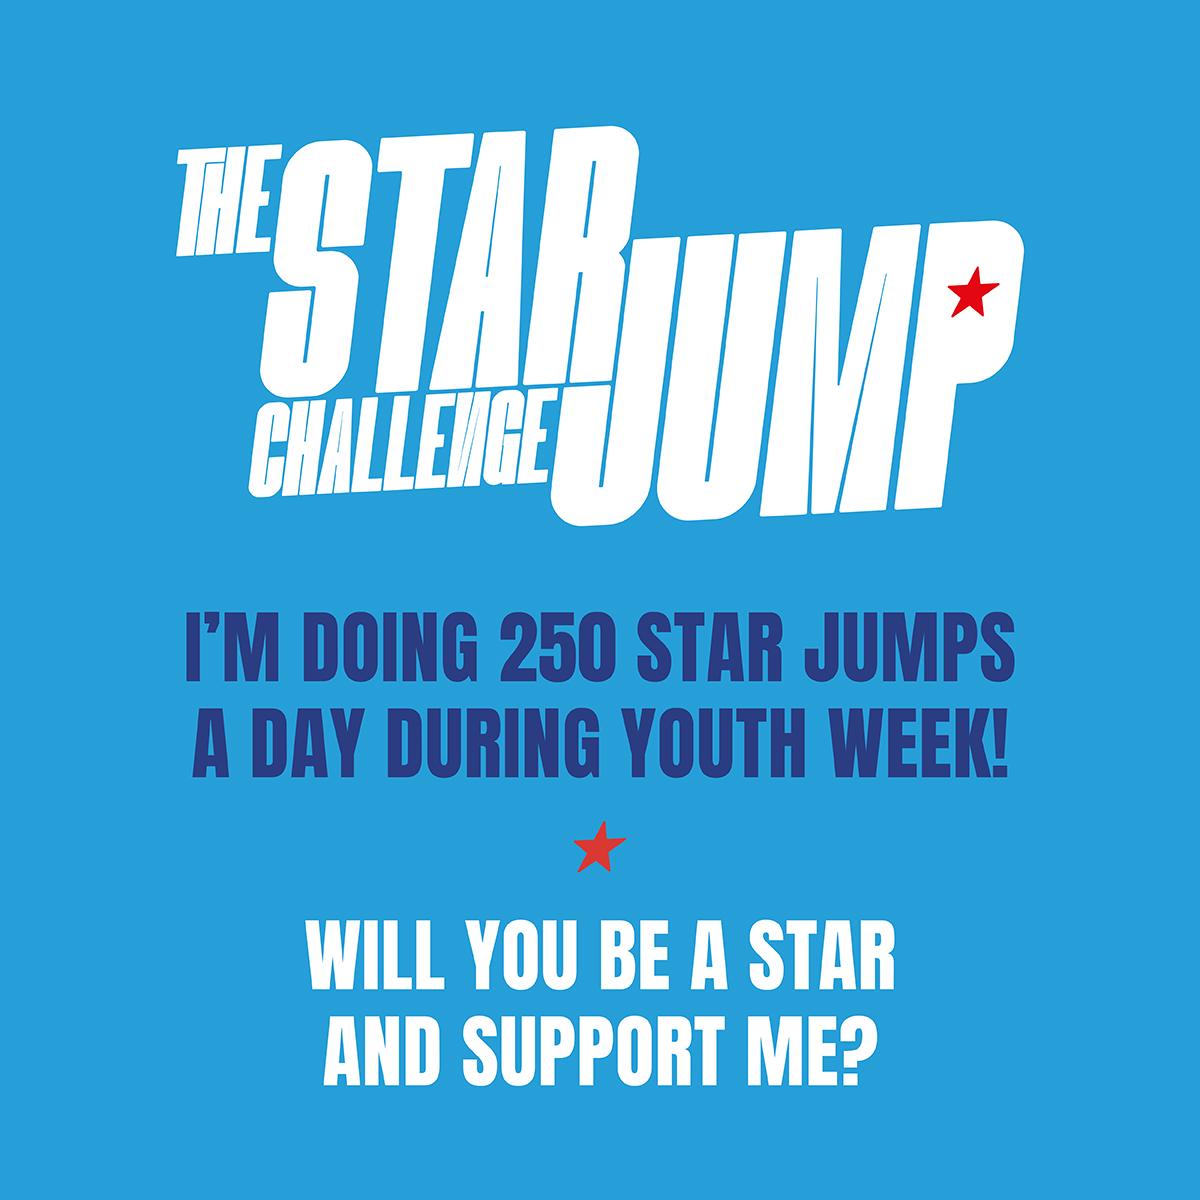 Social Tile 9 - Support - 250 Star Jumps